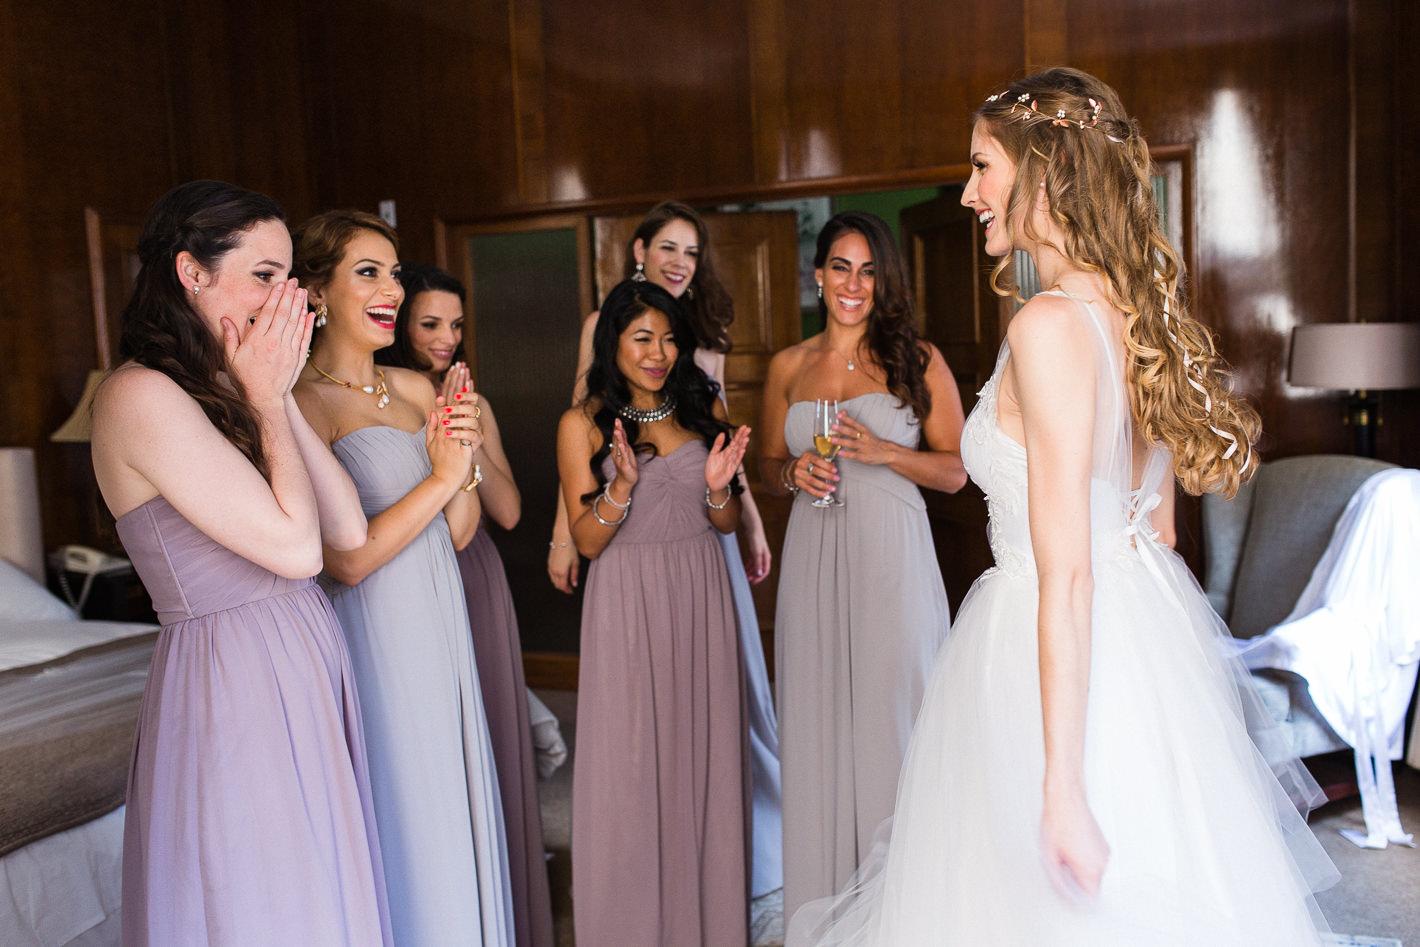 mariage-boheme-chic-au-windsor-4